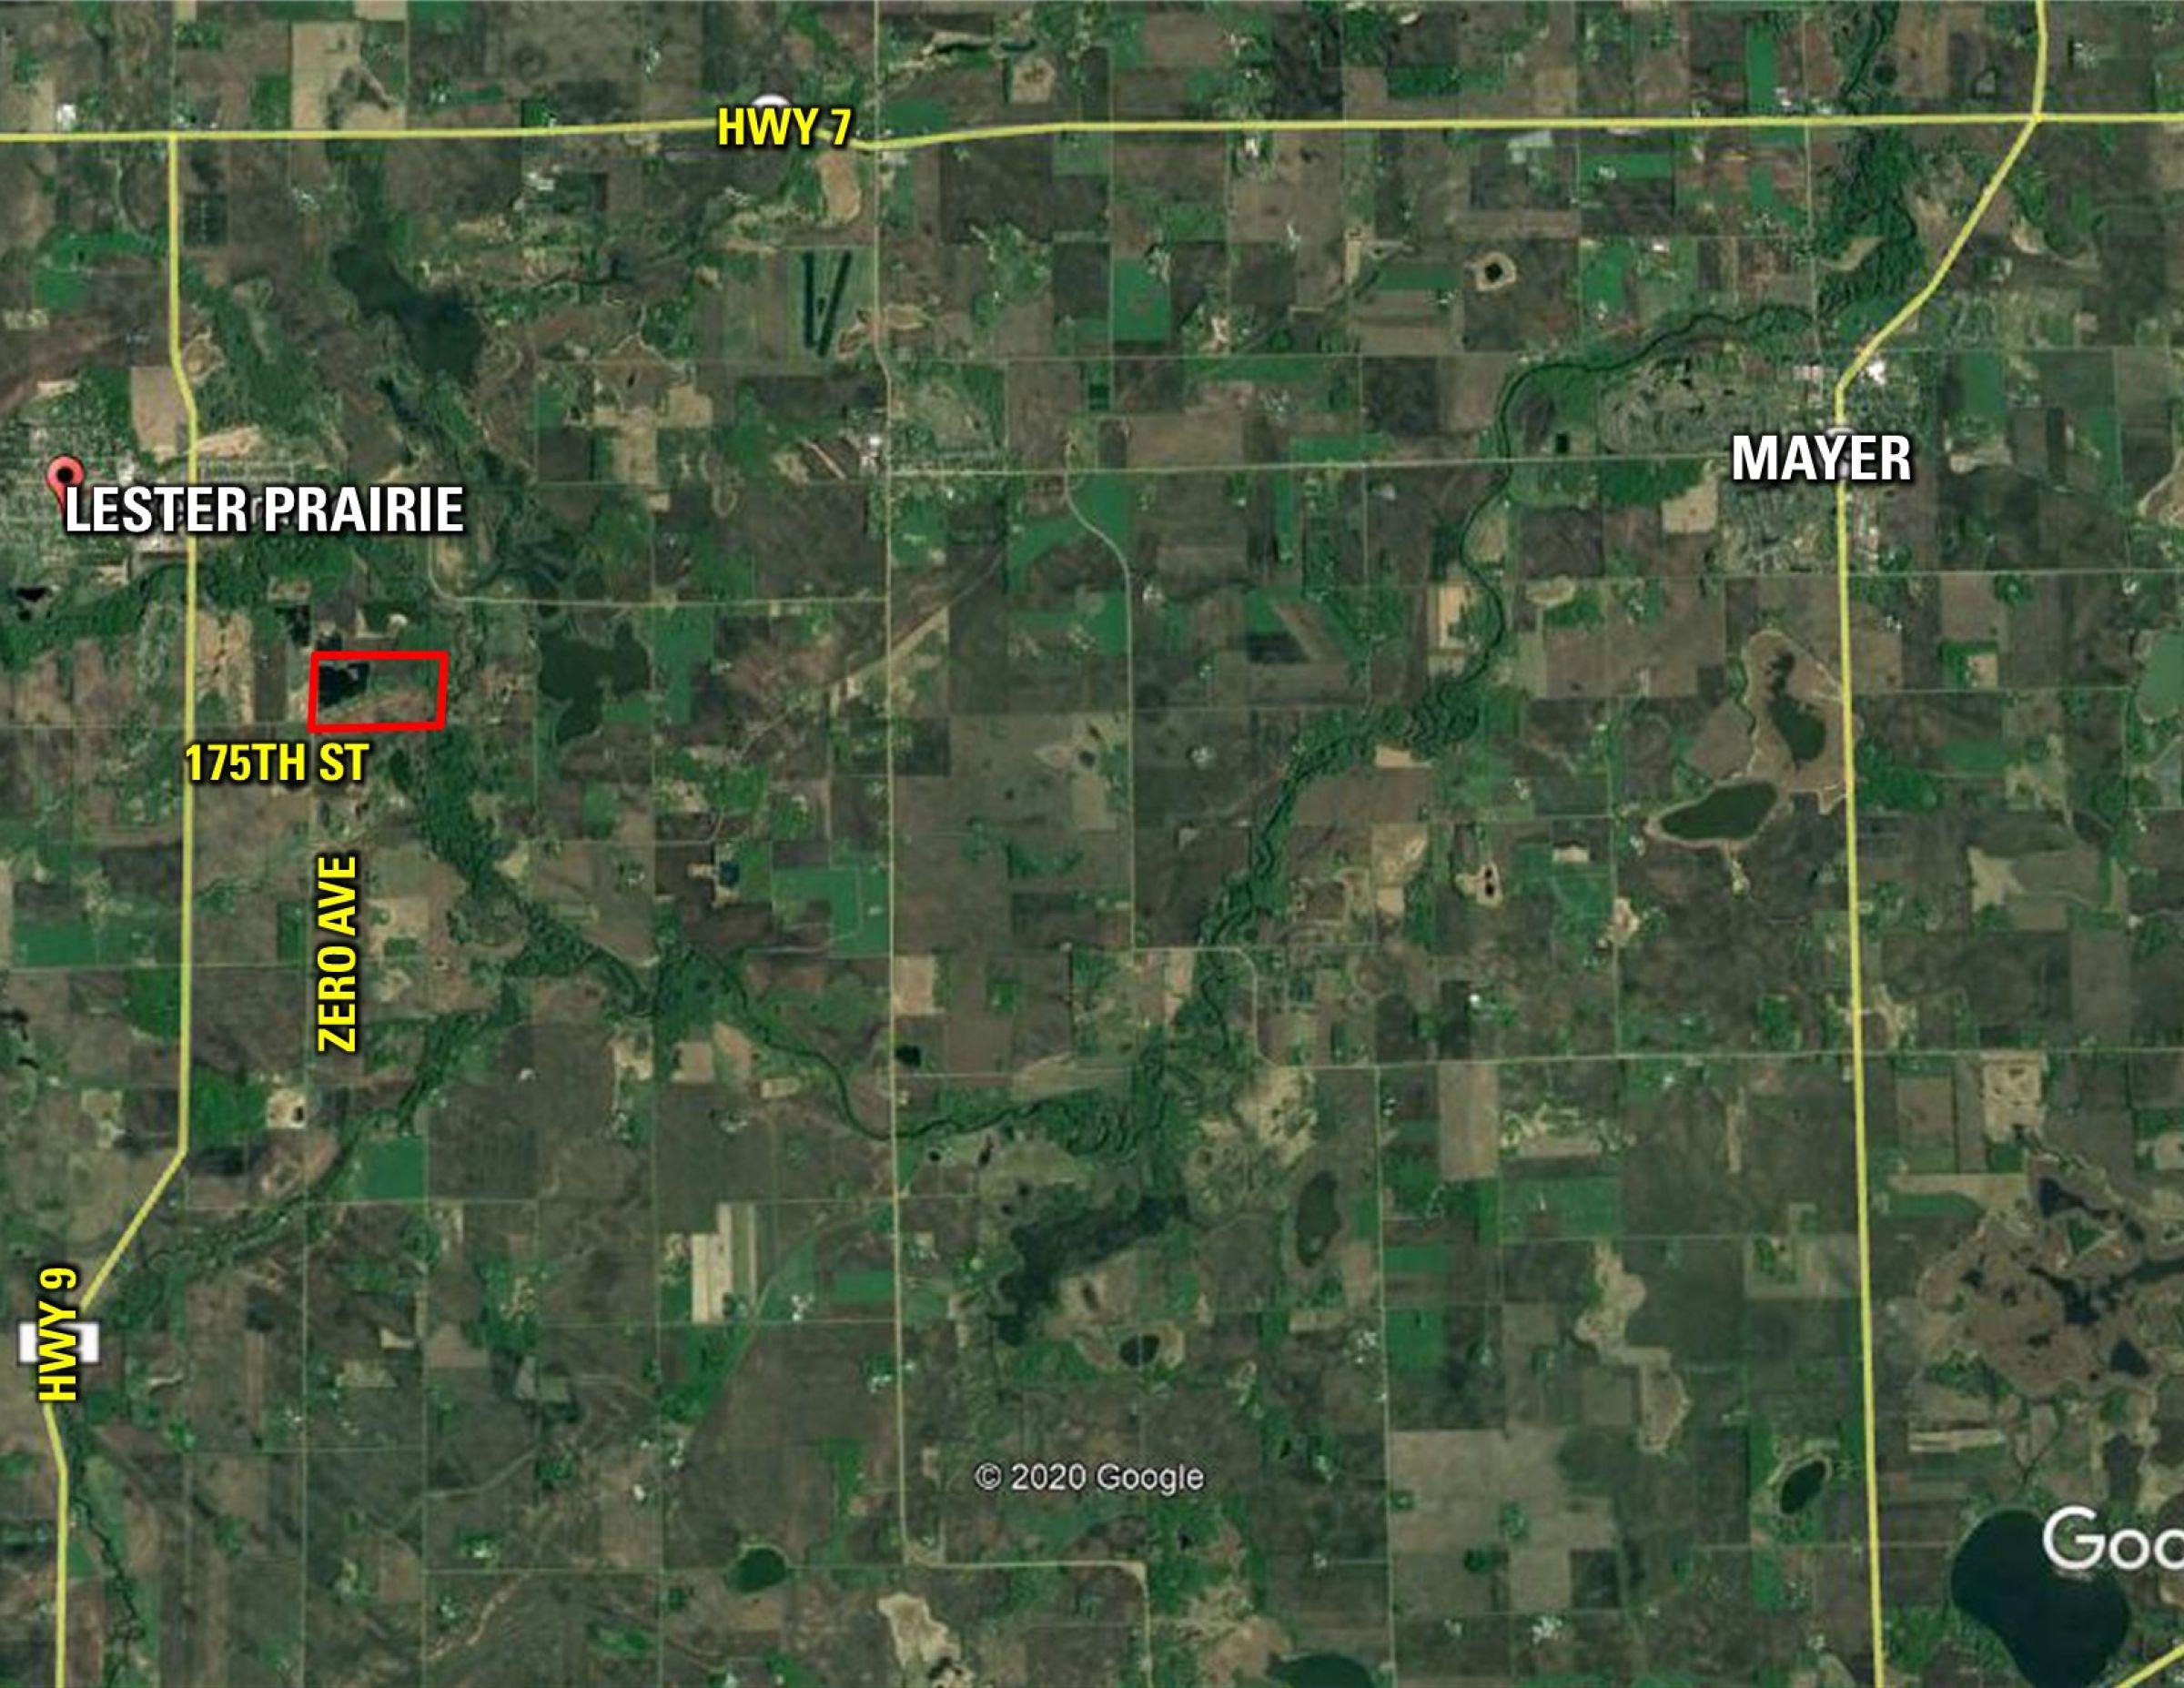 residential-land-mcleod-county-minnesota-80-acres-listing-number-15182-1-2020-09-23-165841.jpg